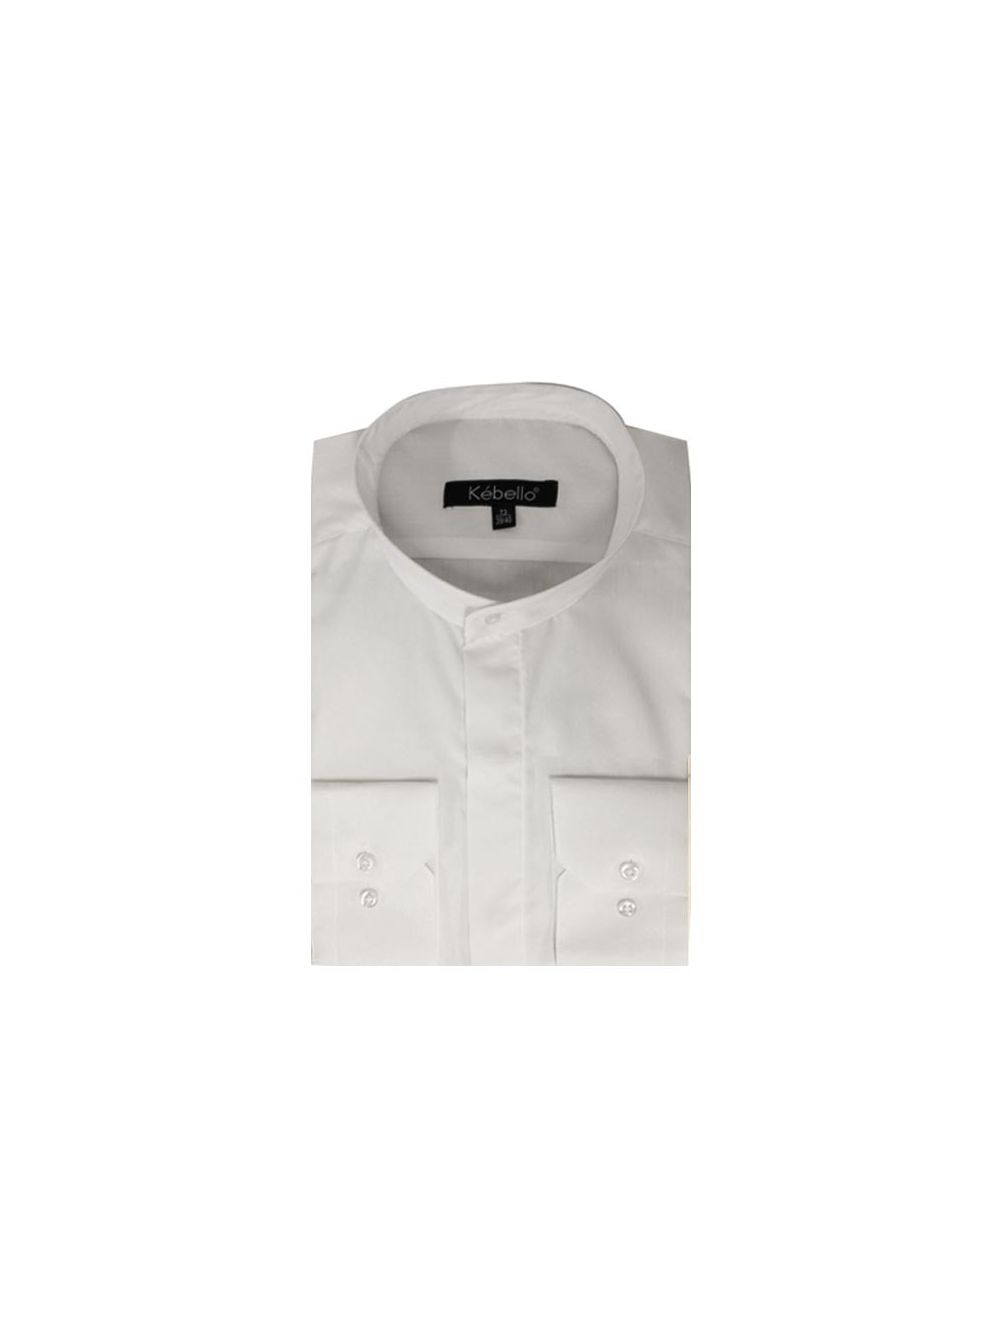 chemise blanche homme col mao pas cher kebello com. Black Bedroom Furniture Sets. Home Design Ideas